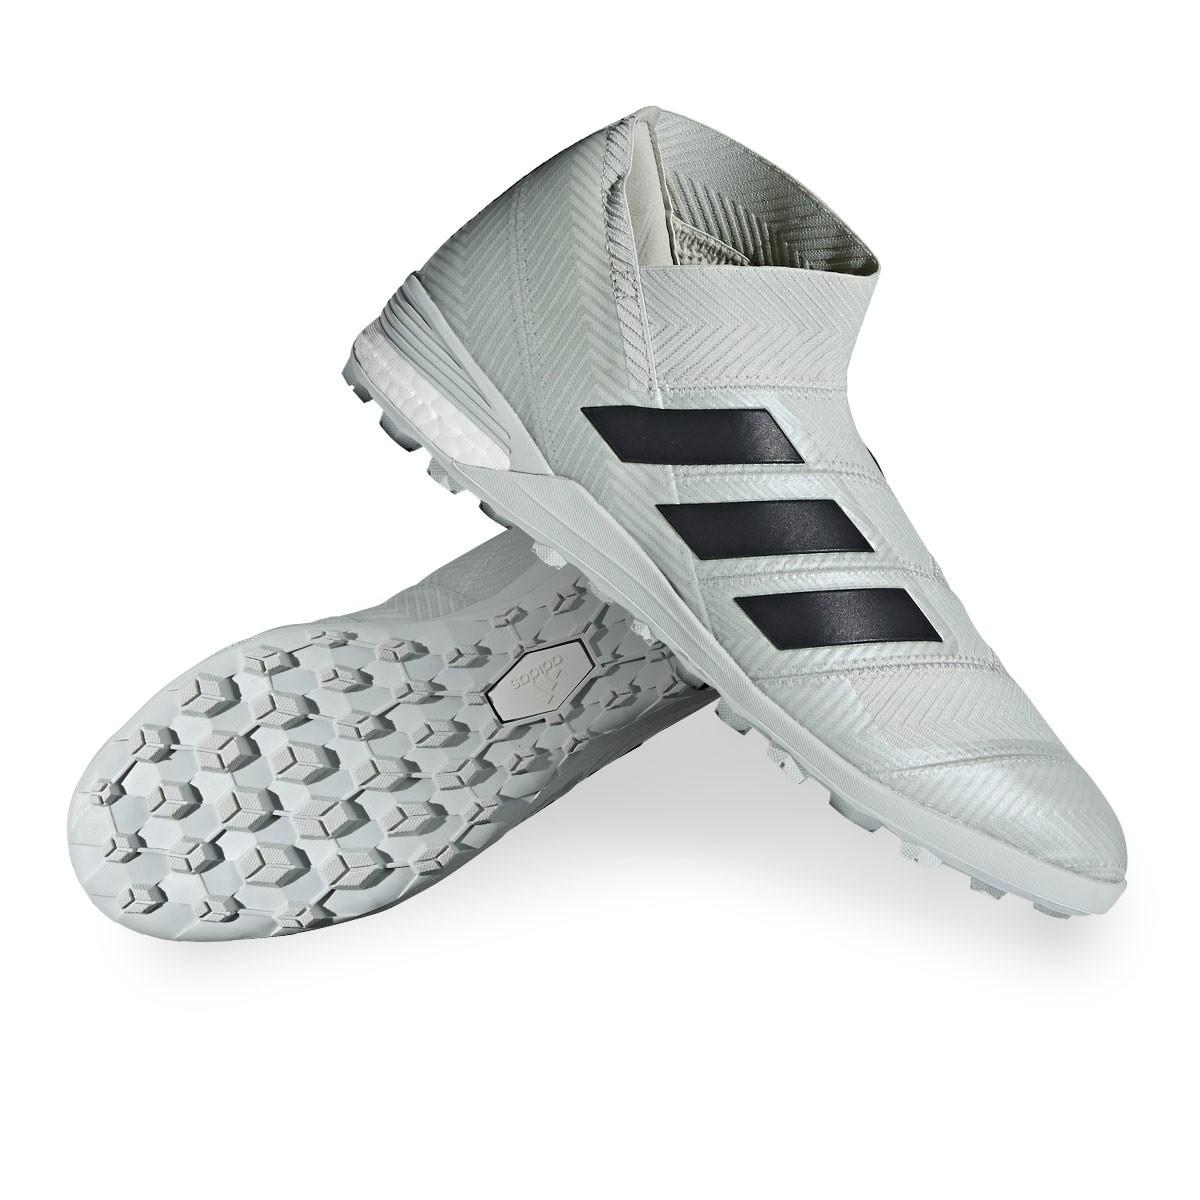 new product 1ca63 d288d Football Boot adidas Nemeziz Tango 18+ Turf Ash silver-White tint - Leaked  soccer